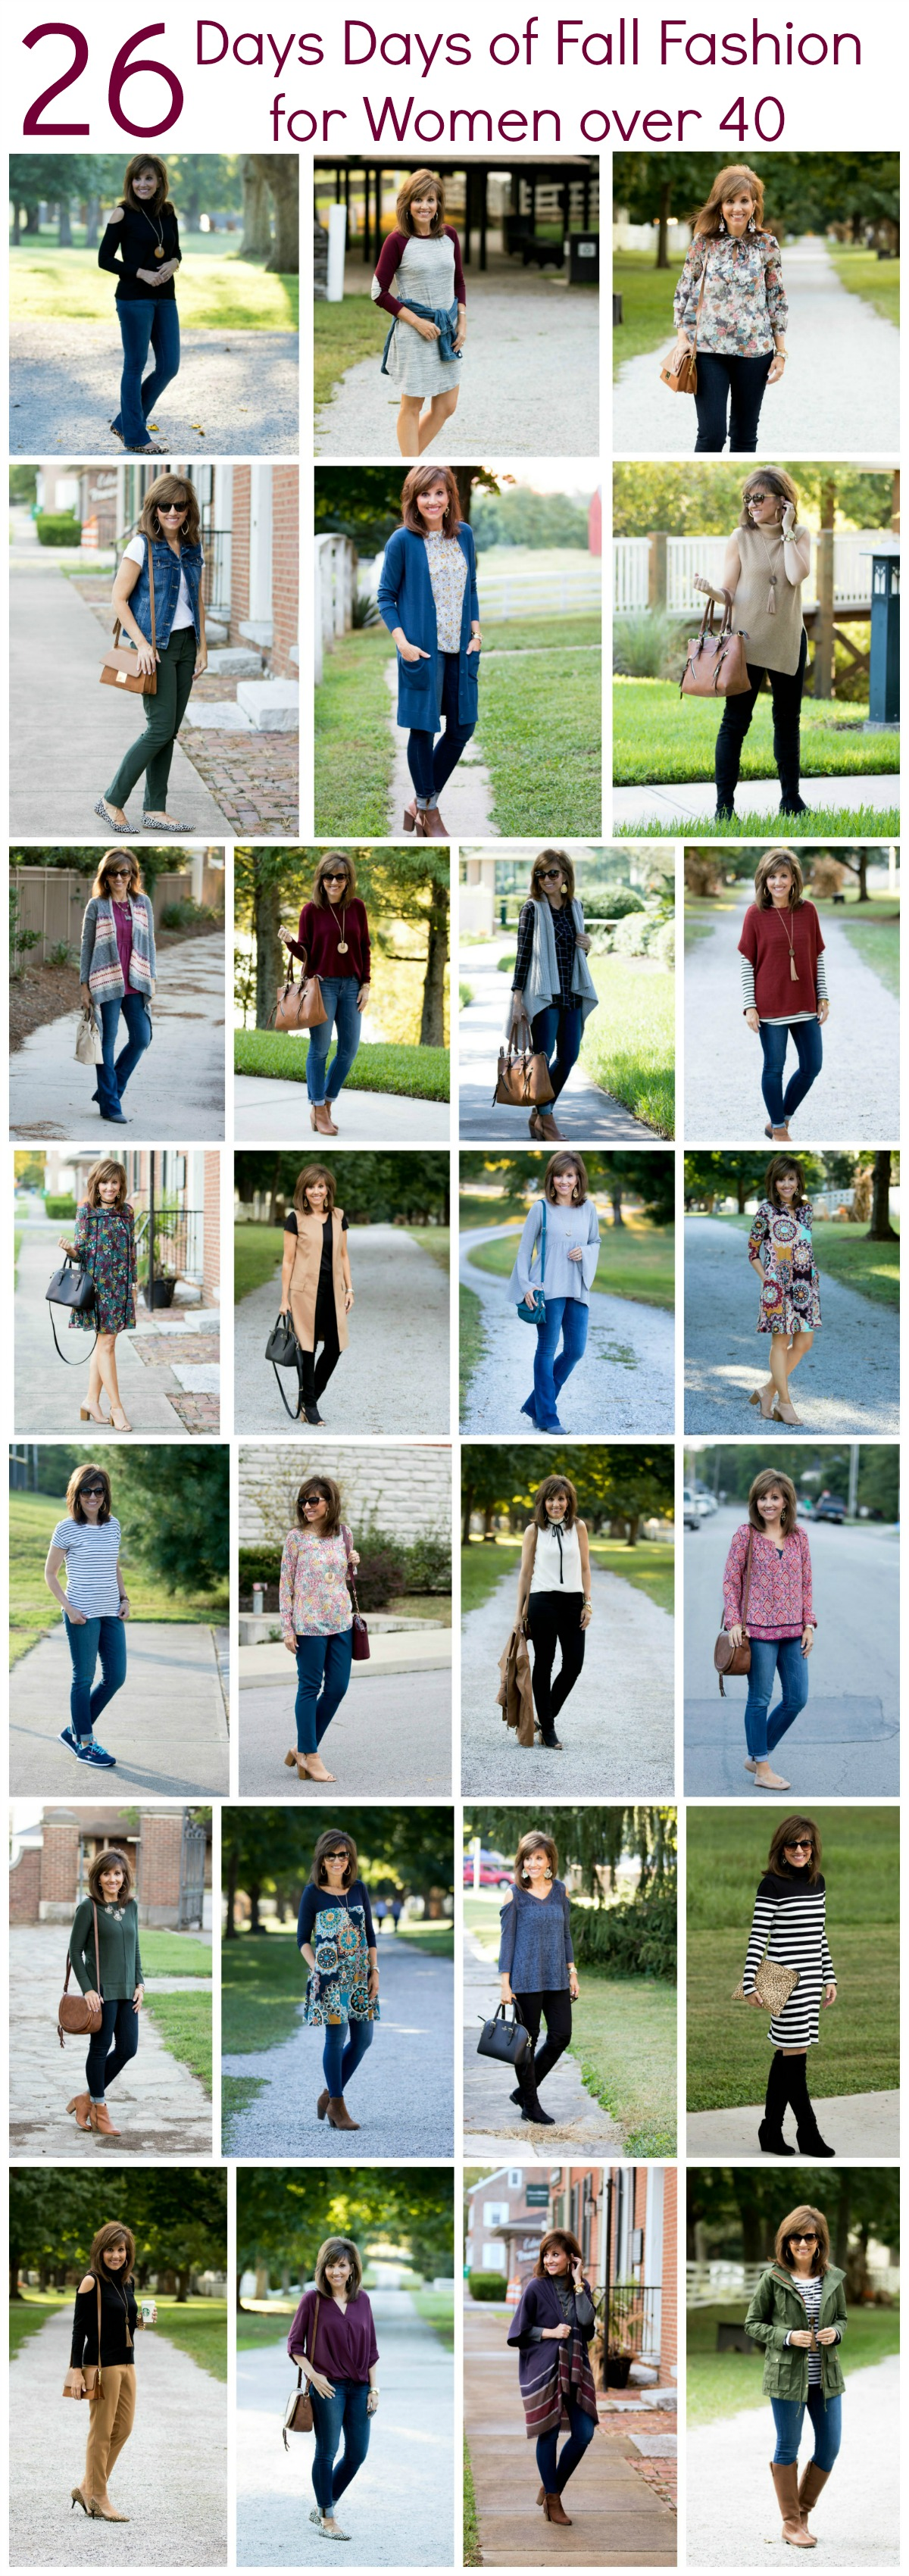 26-days-of-fall-fashion